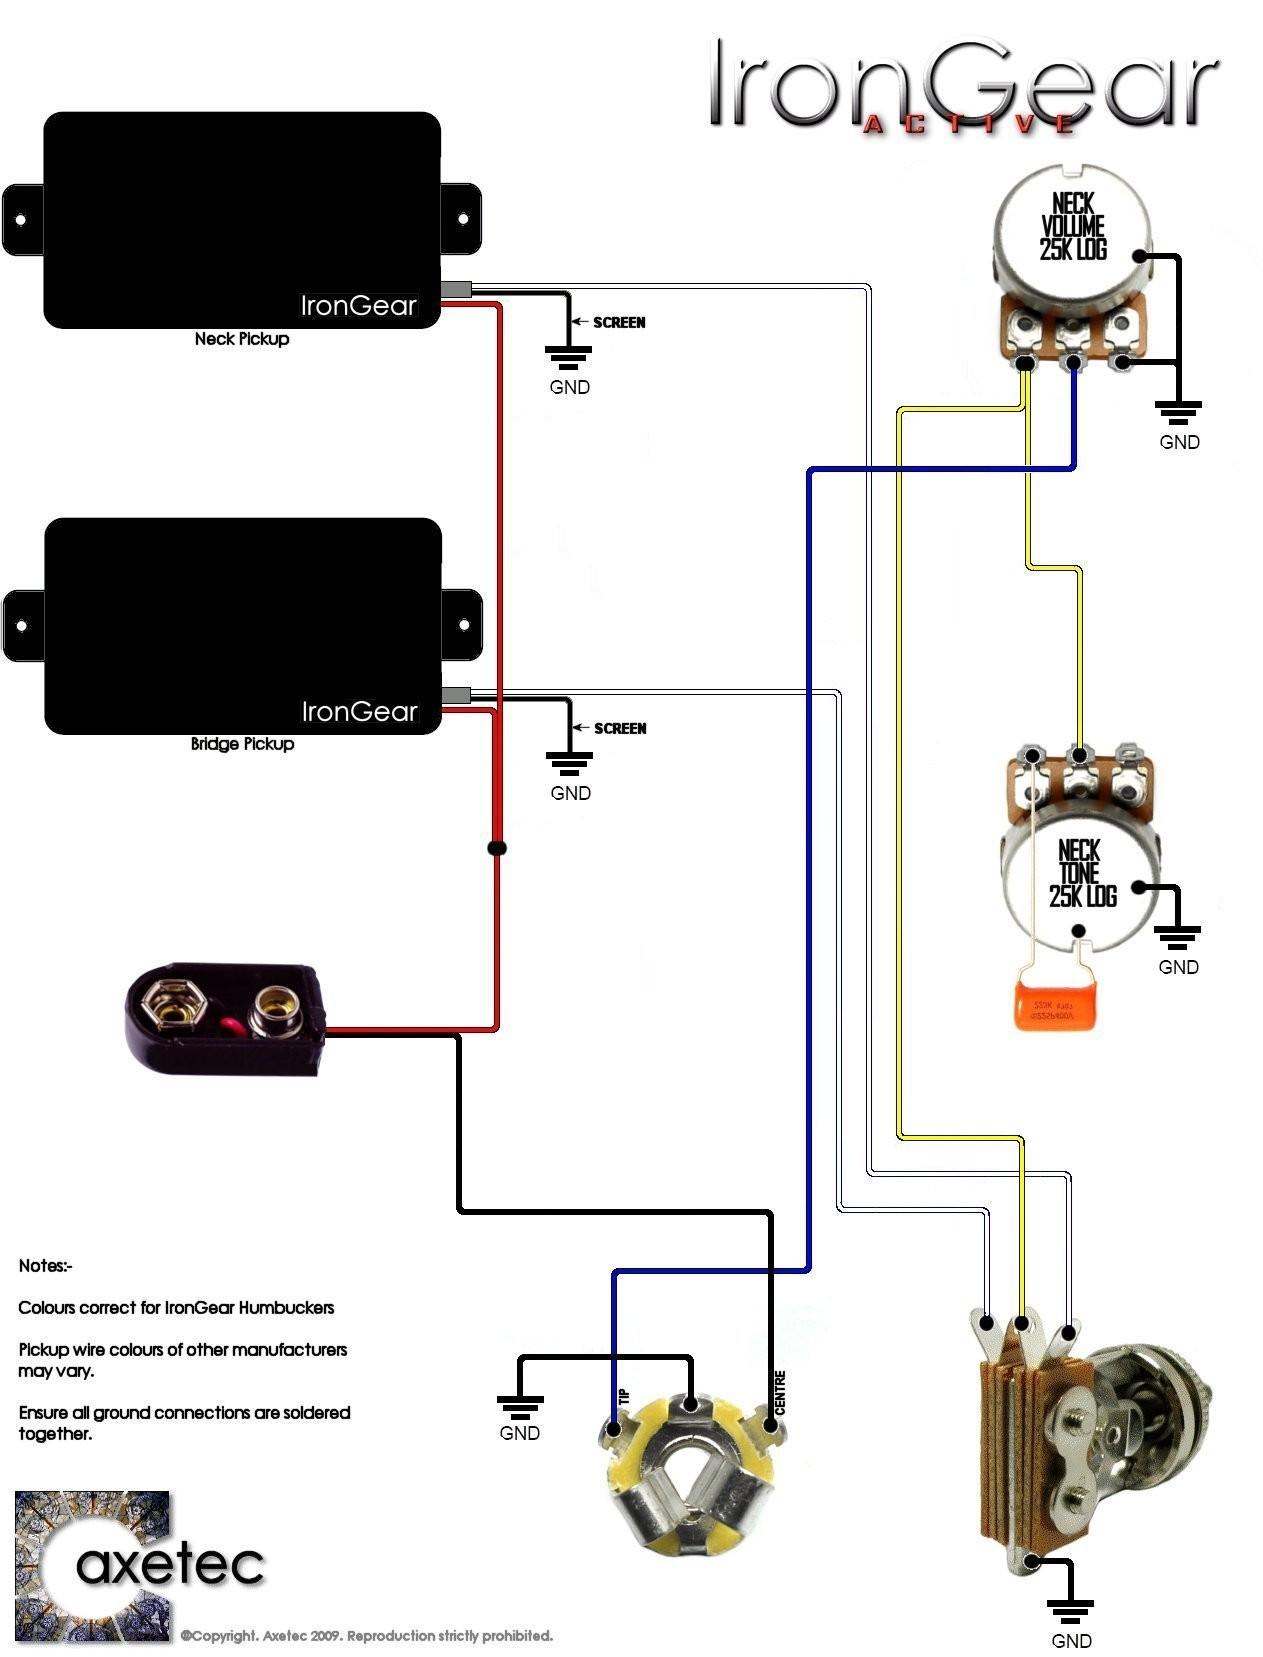 Ibanez Electric Guitar Wiring Diagram Inspirationa Guitar Wiring Diagram 2 Humbucker 1 Volume 1 tone –